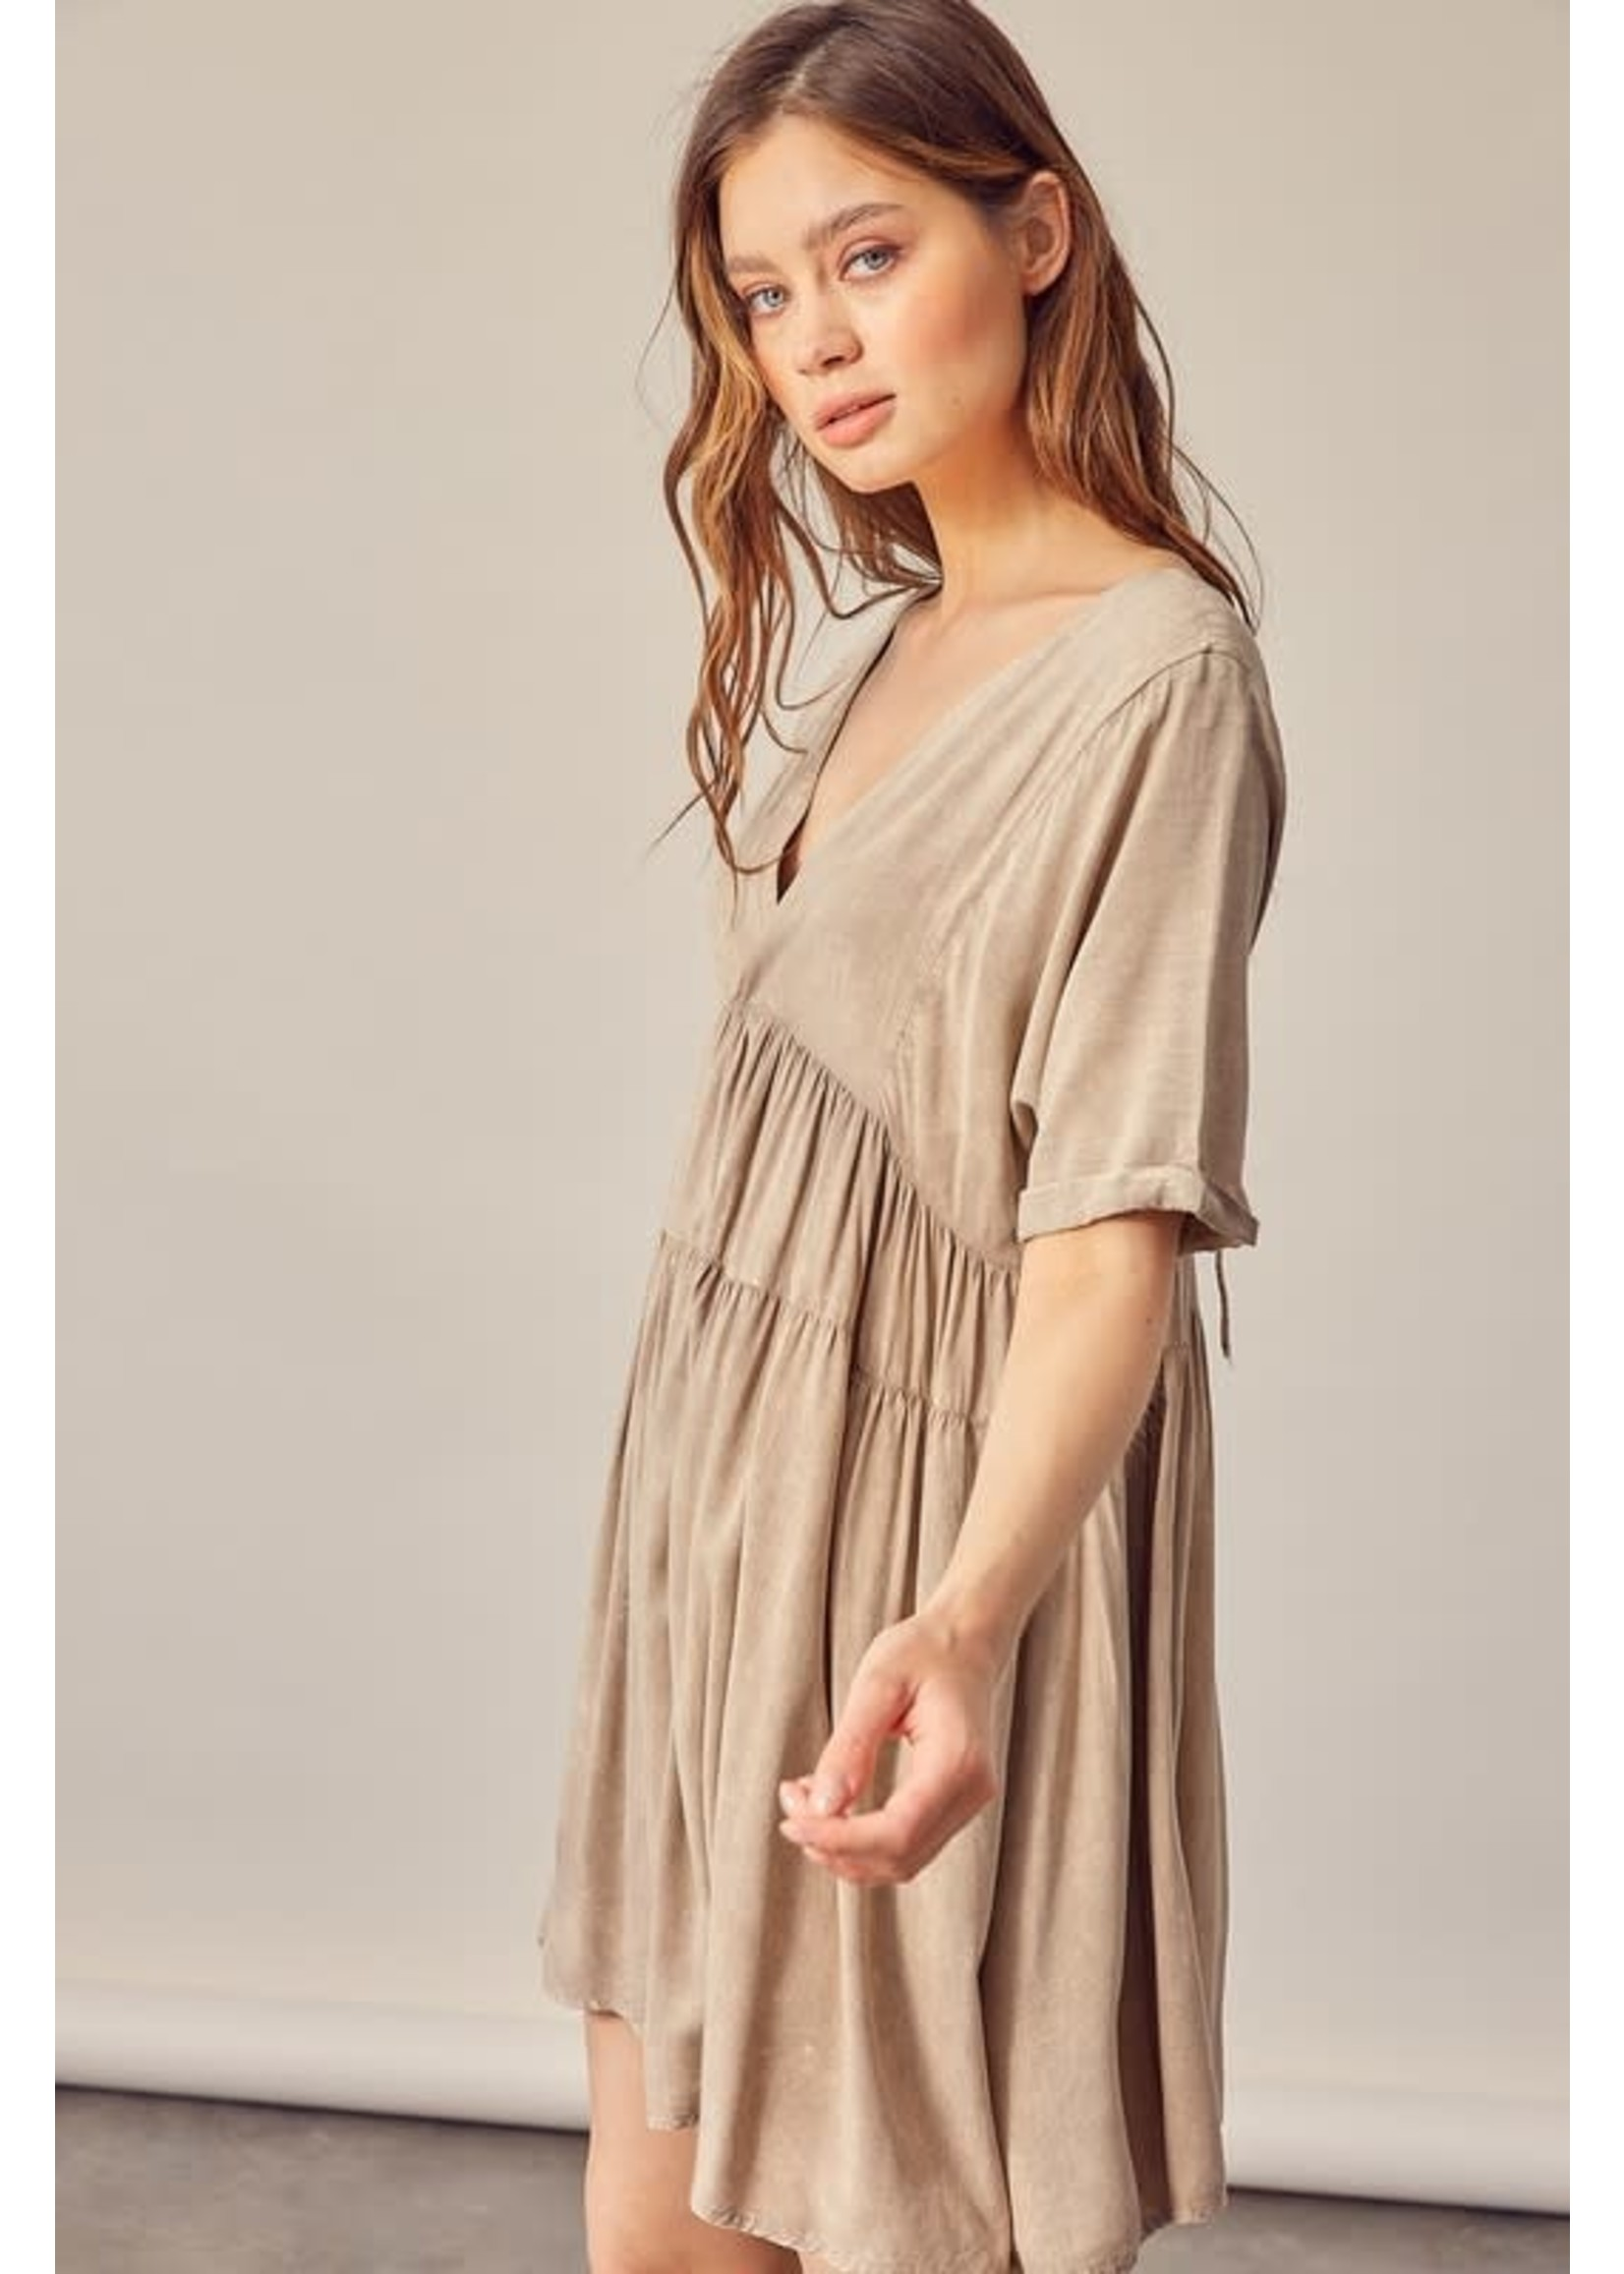 Mustard Seed Washed Flowy Dress - S17247